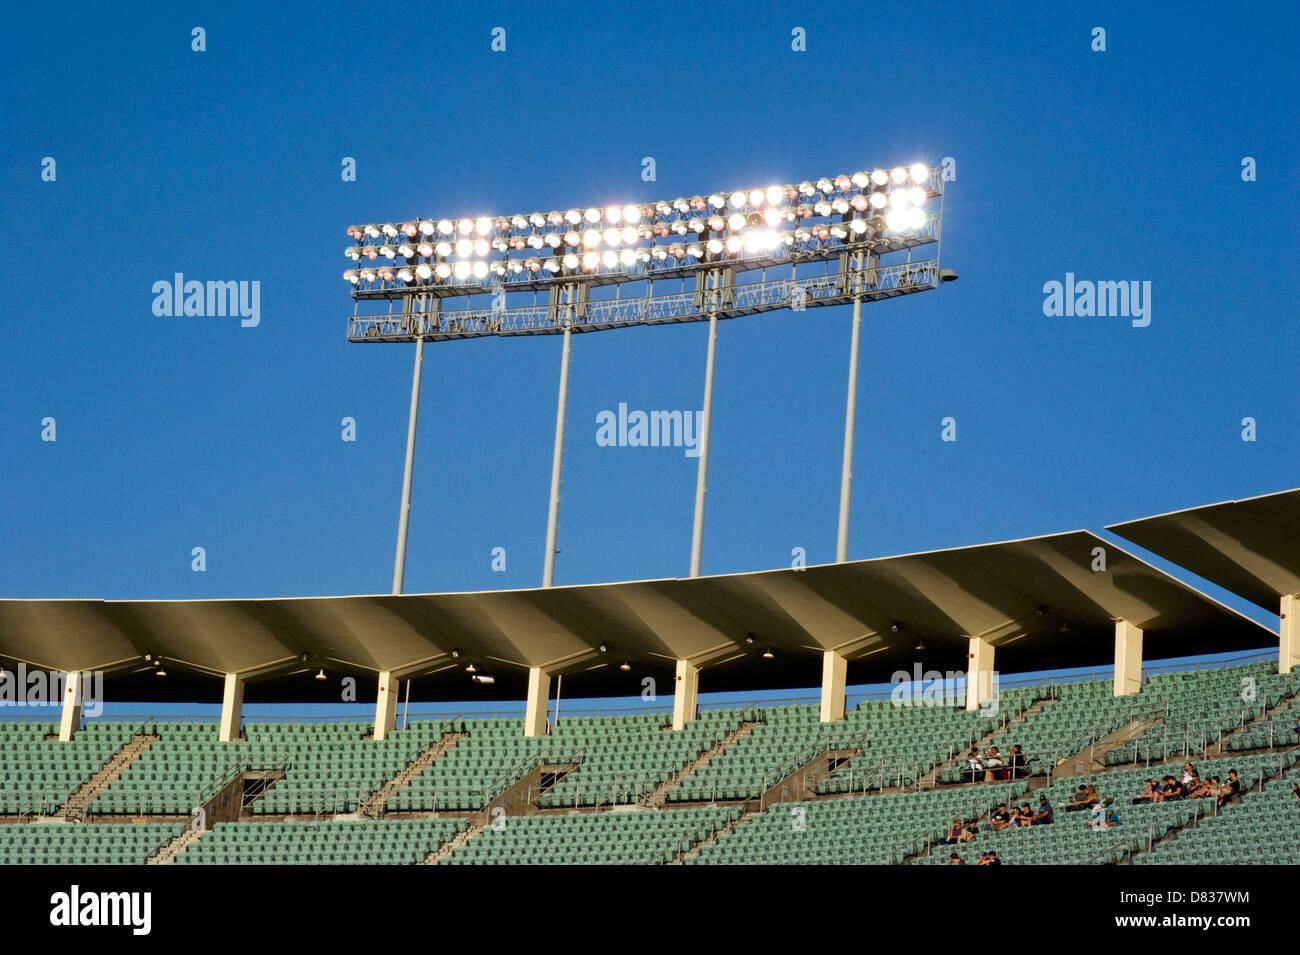 Stadium lighting at Dodger Stadium - Stock Image